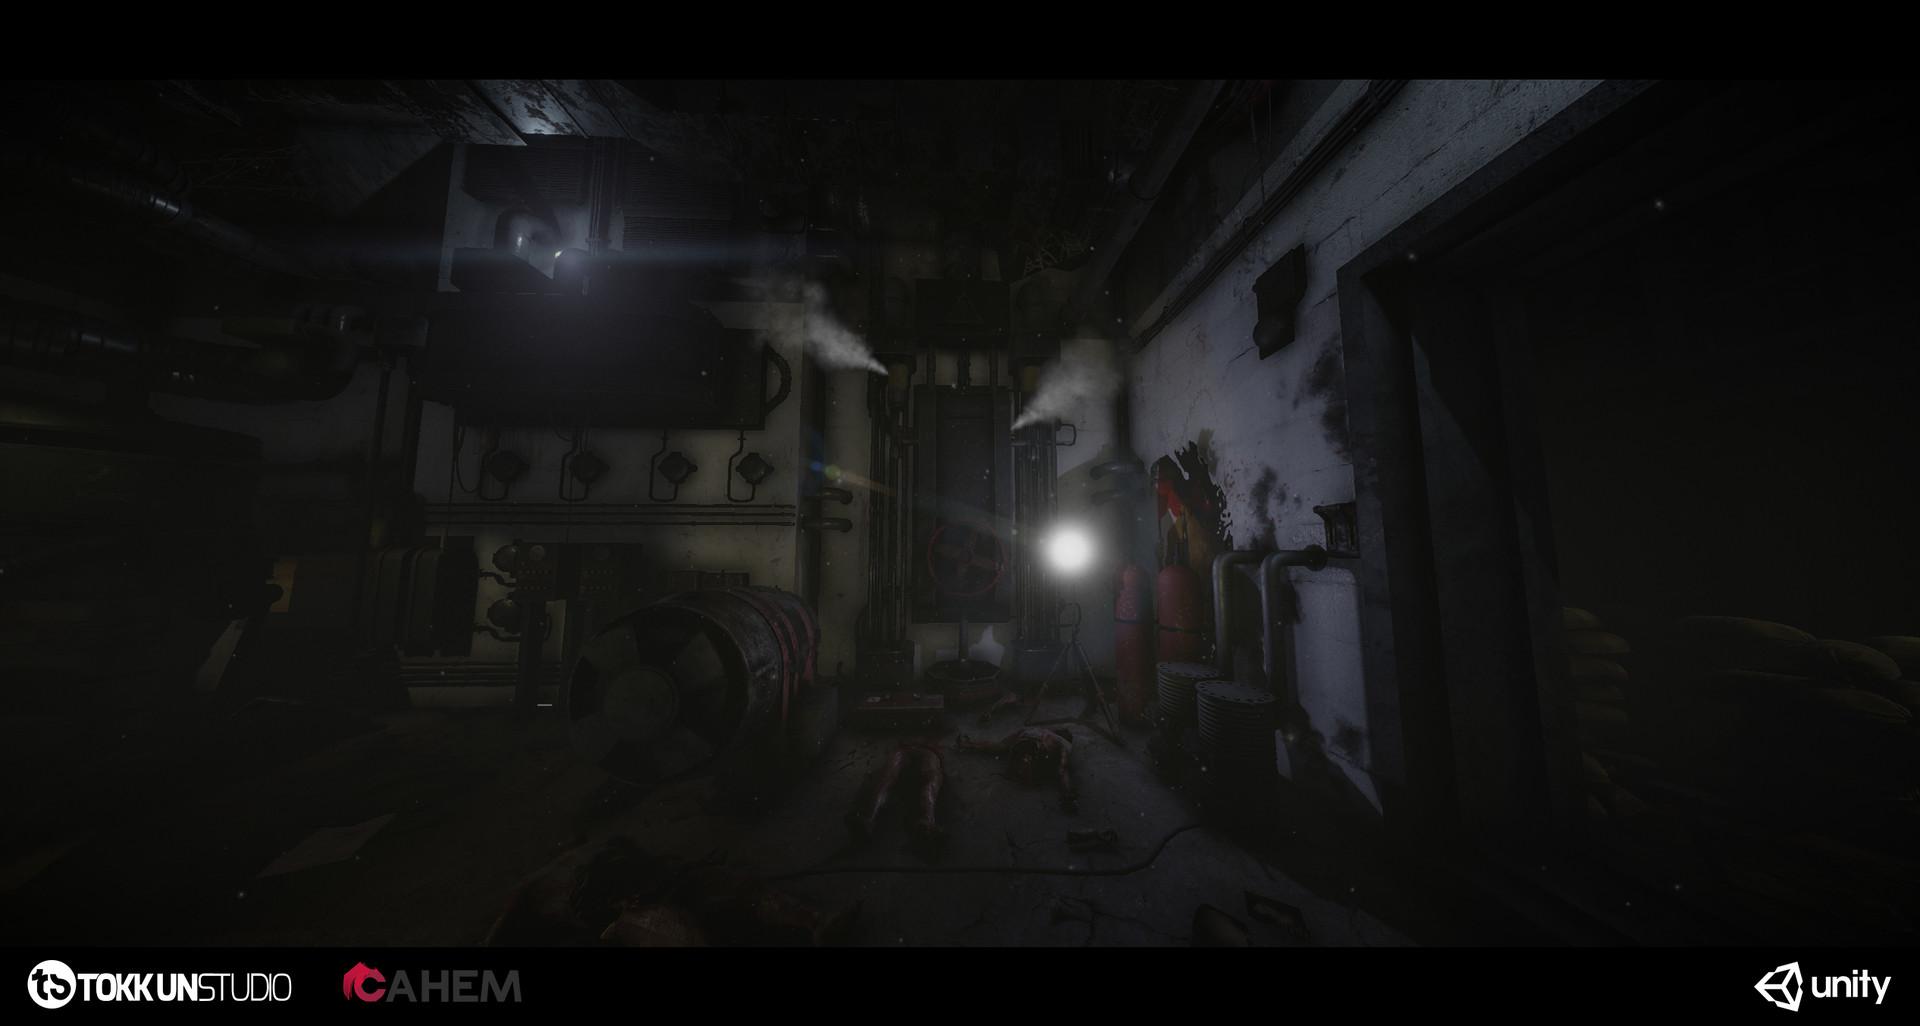 Tokkun studio bunker shot 17